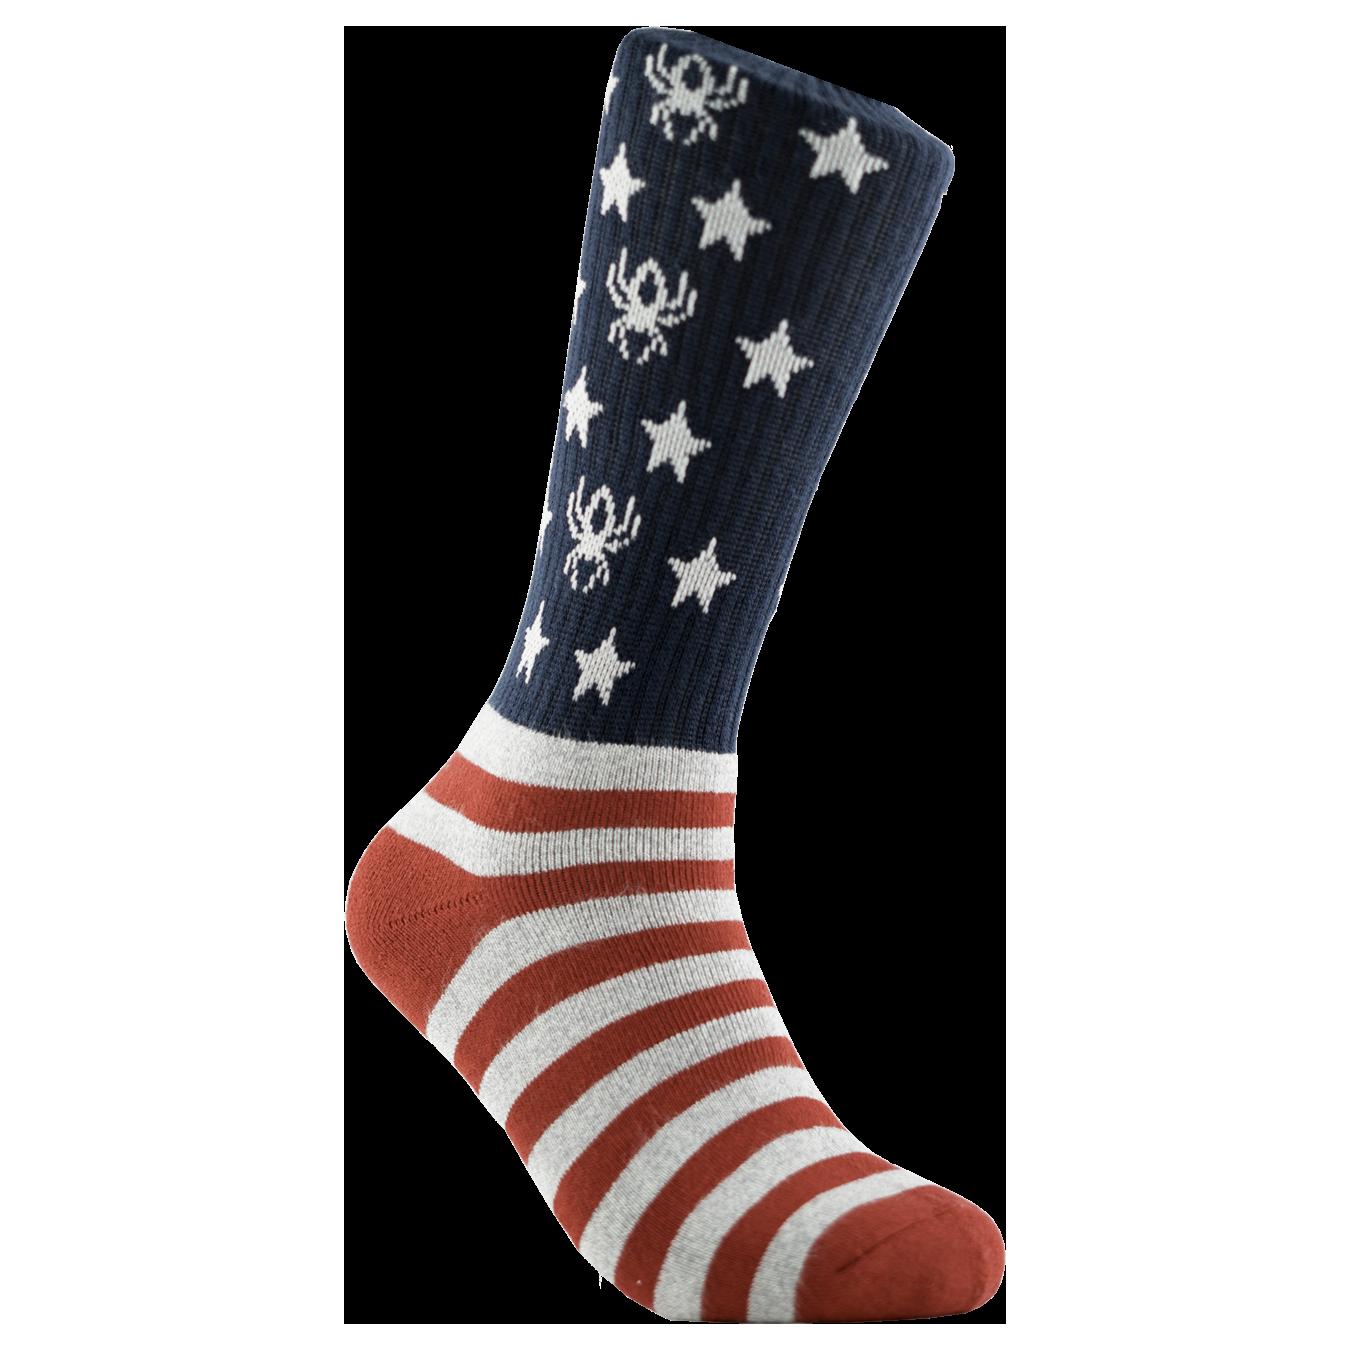 Redback Boots Bamboo Crew USA Flag Socks